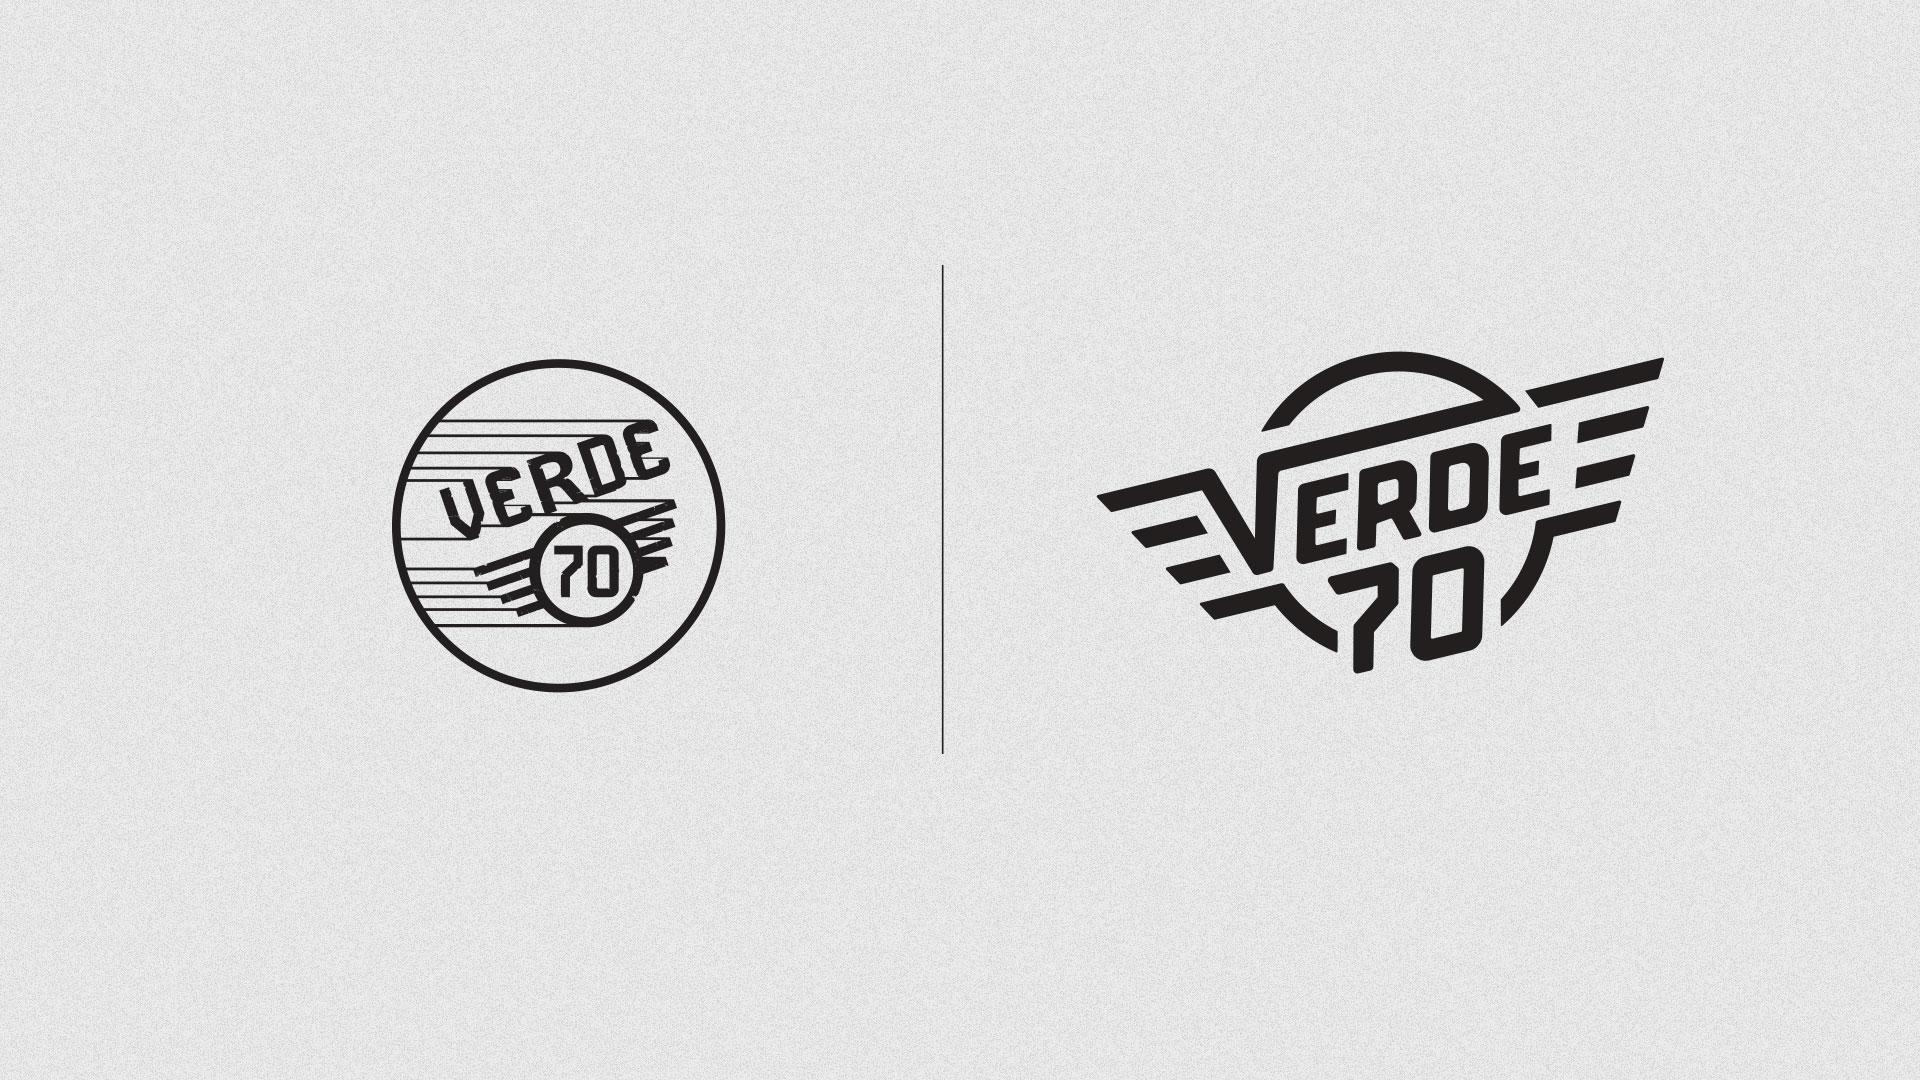 Logotipo: Before & afger